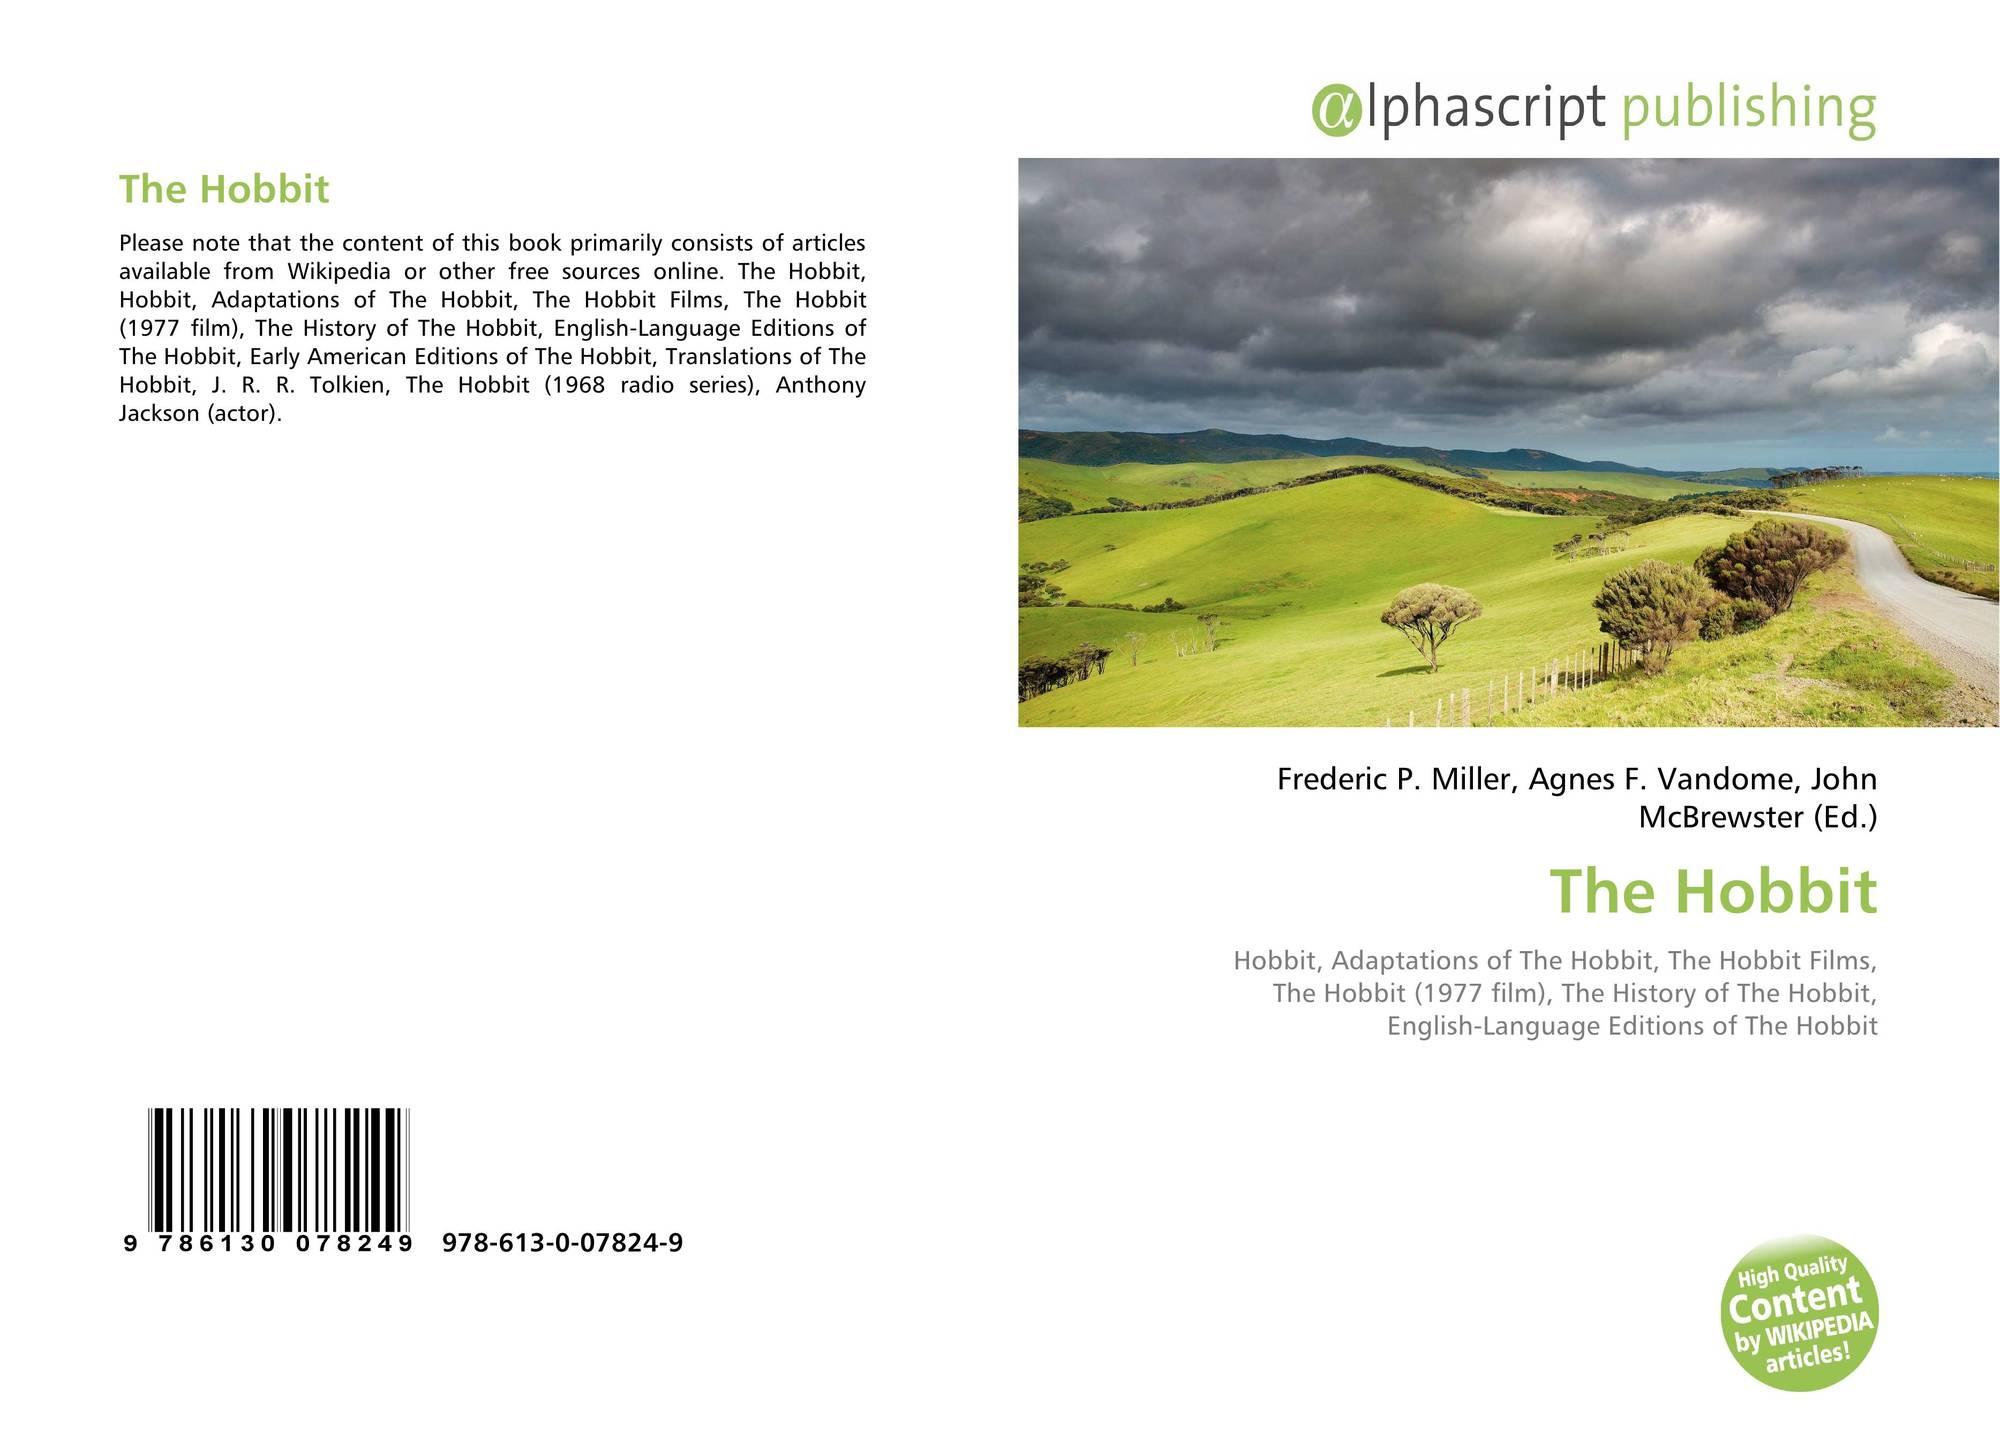 Adaptations of The Hobbit